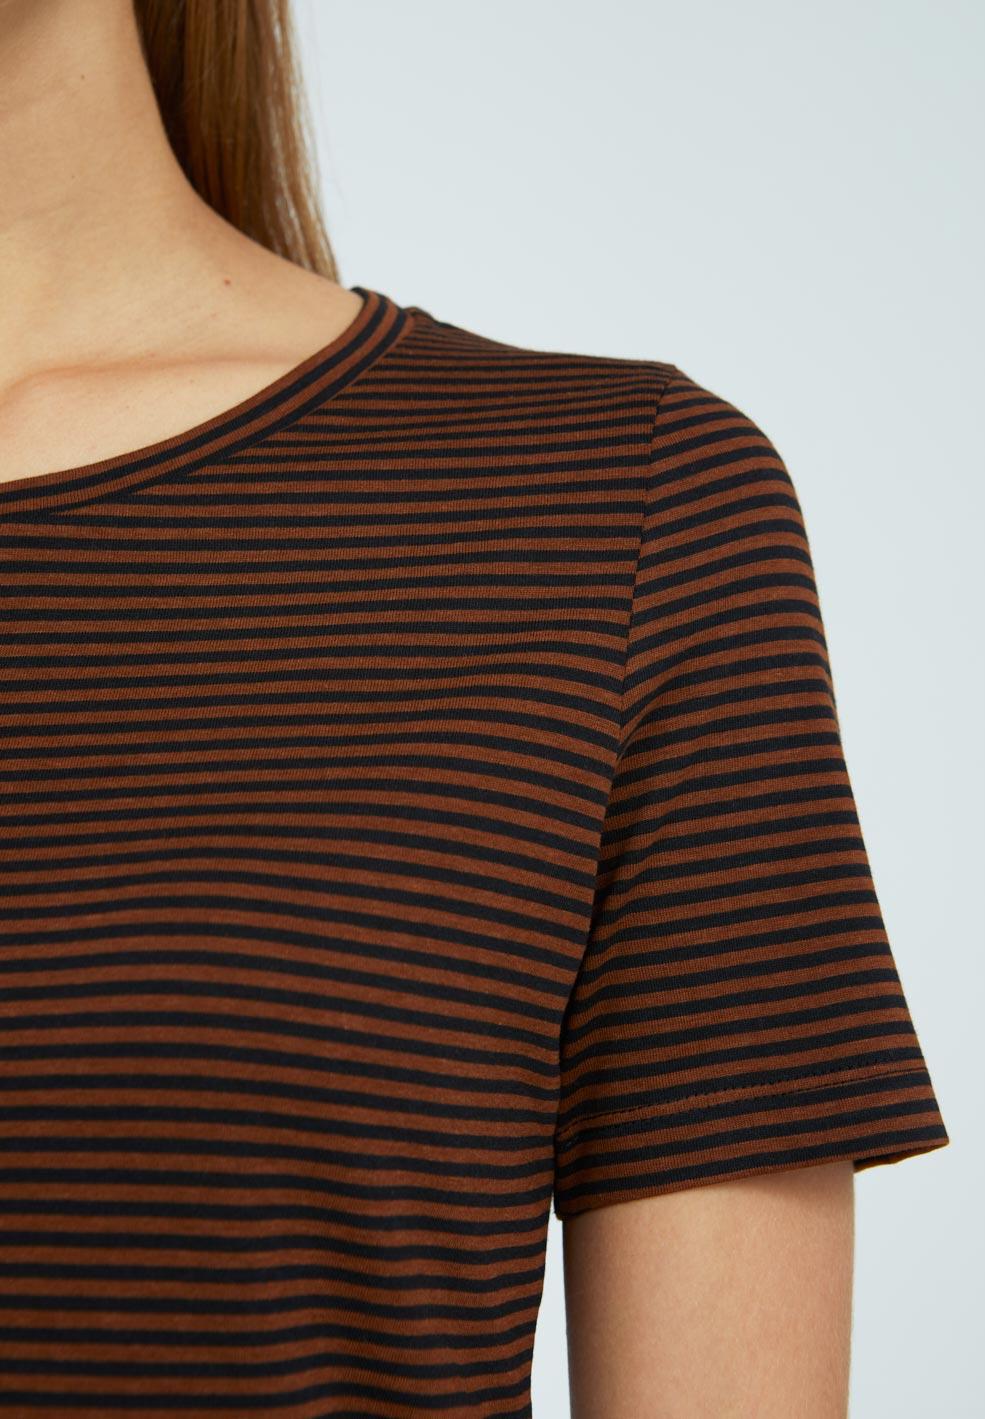 LIDIAA RING STRIPES T-Shirt made of TENCEL™ Lyocell Mix